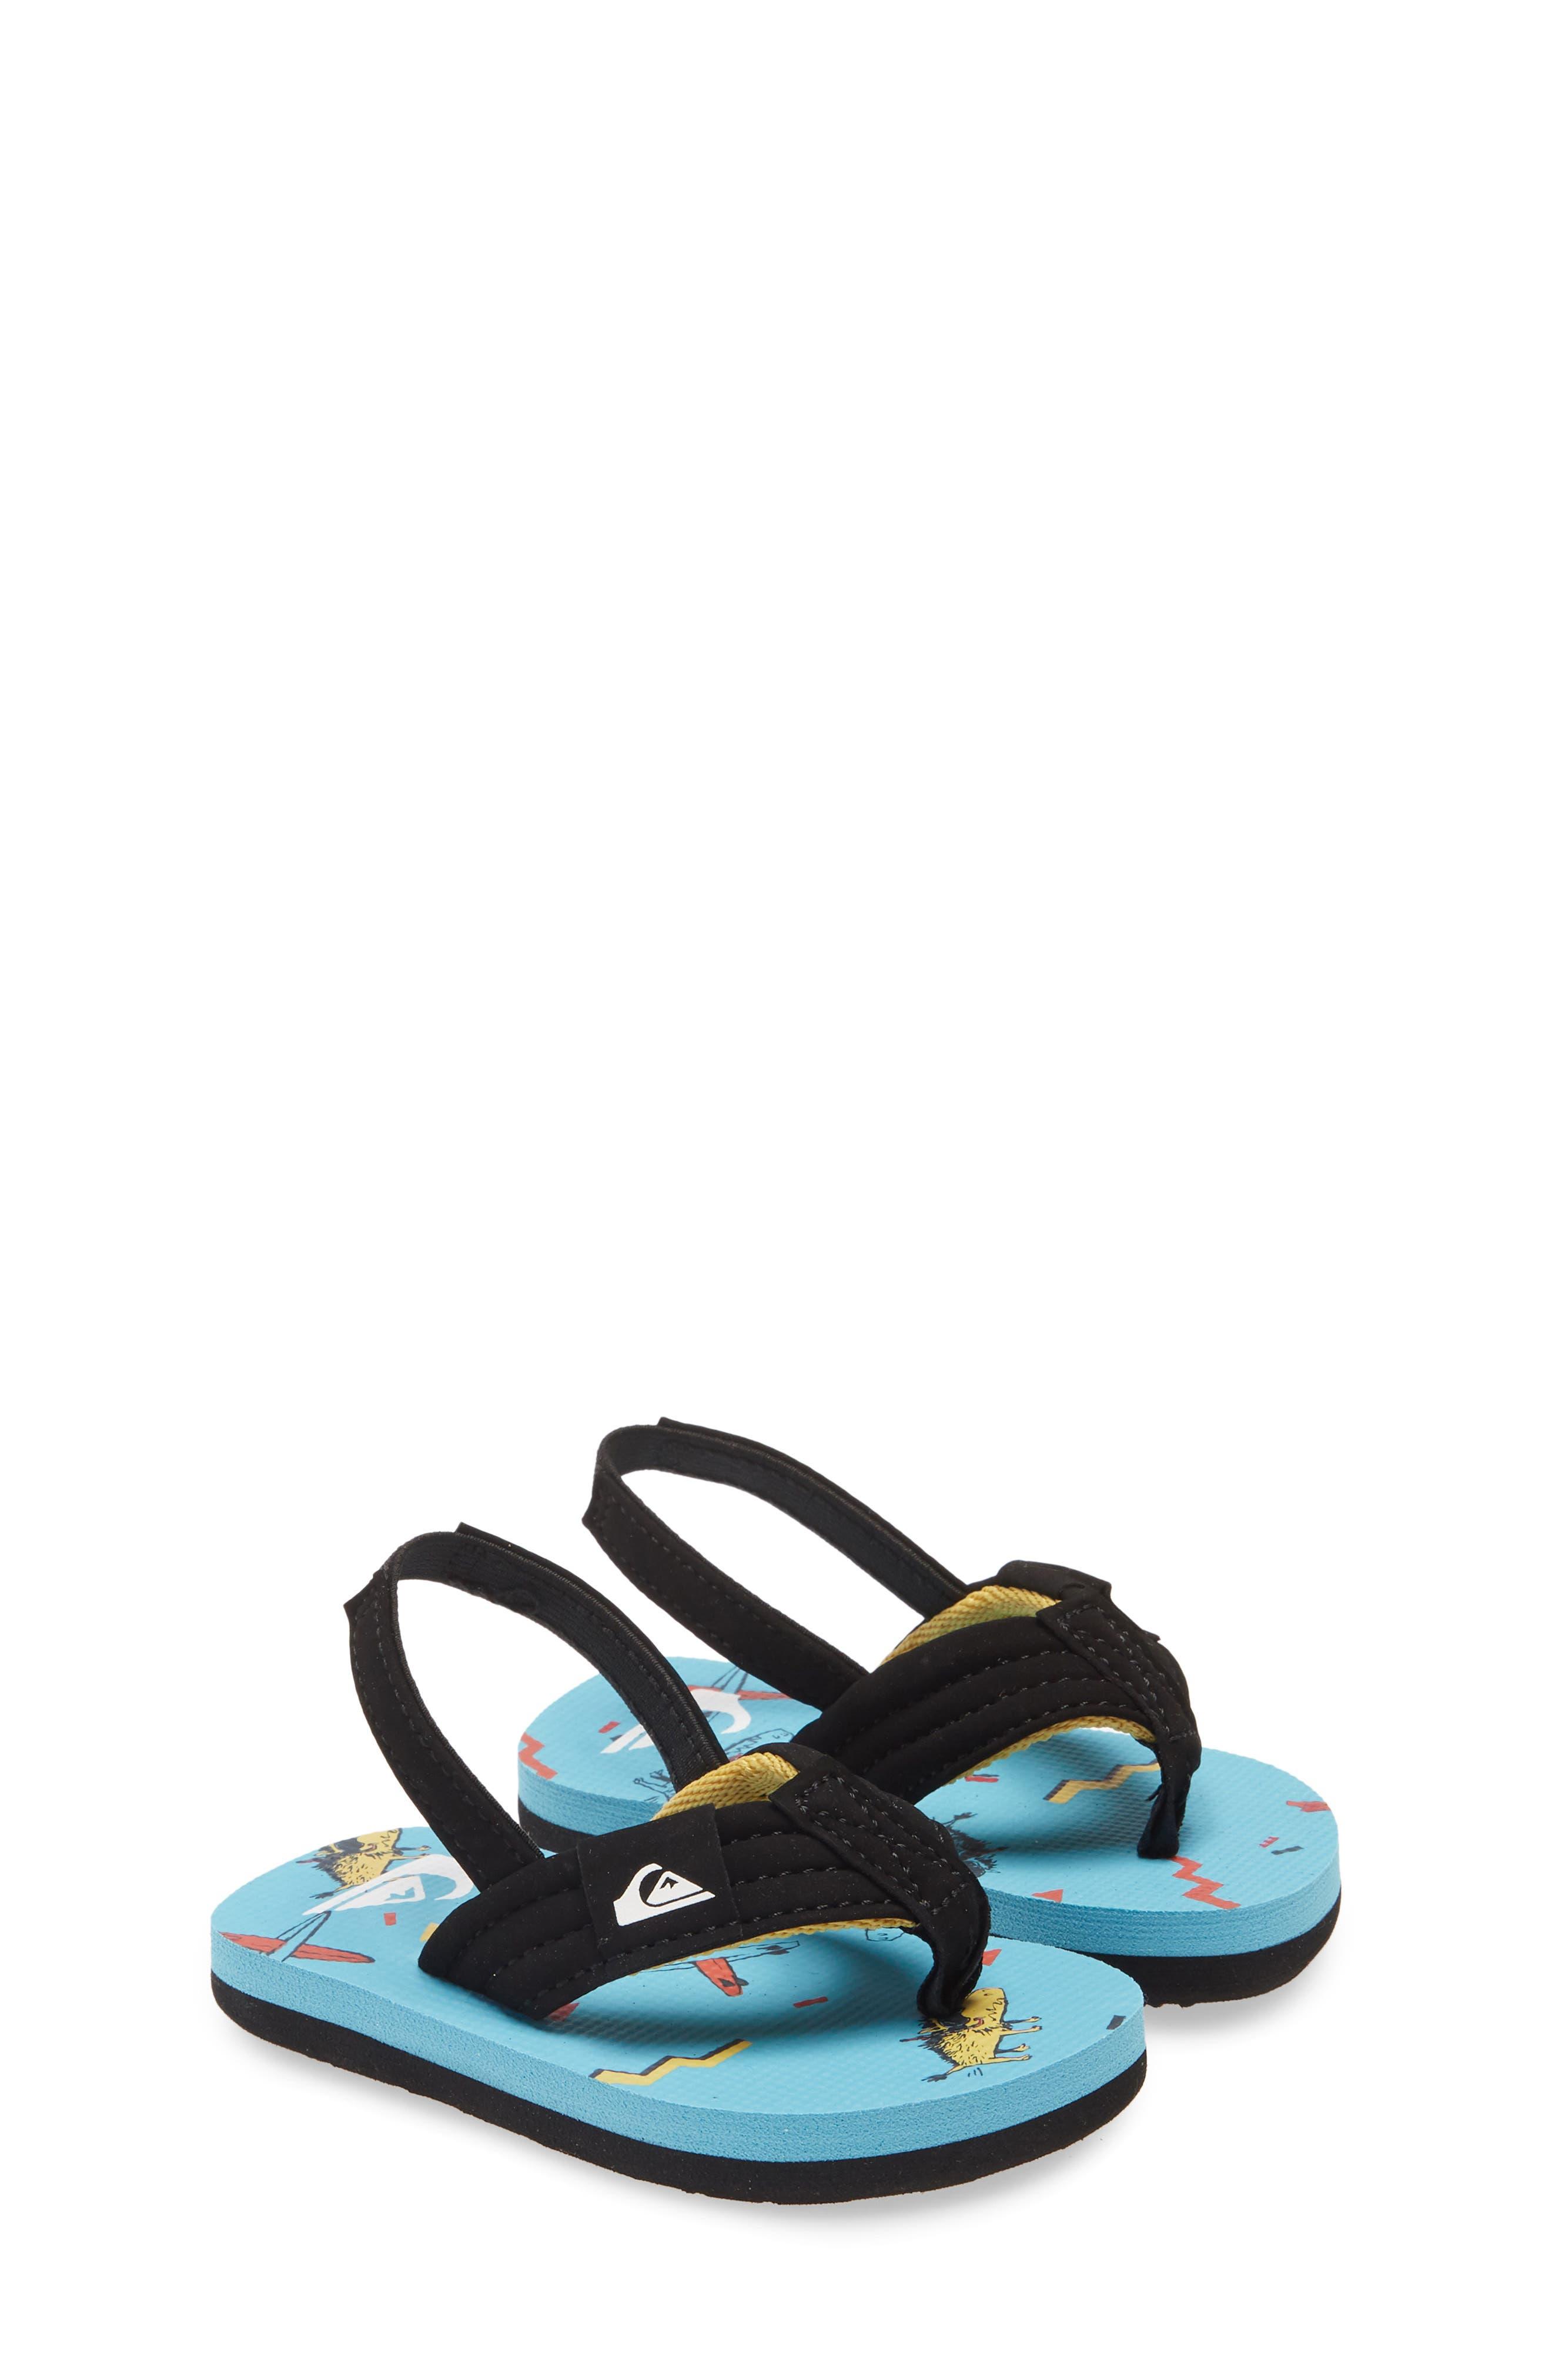 Kids' Quiksilver Shoes | Nordstrom